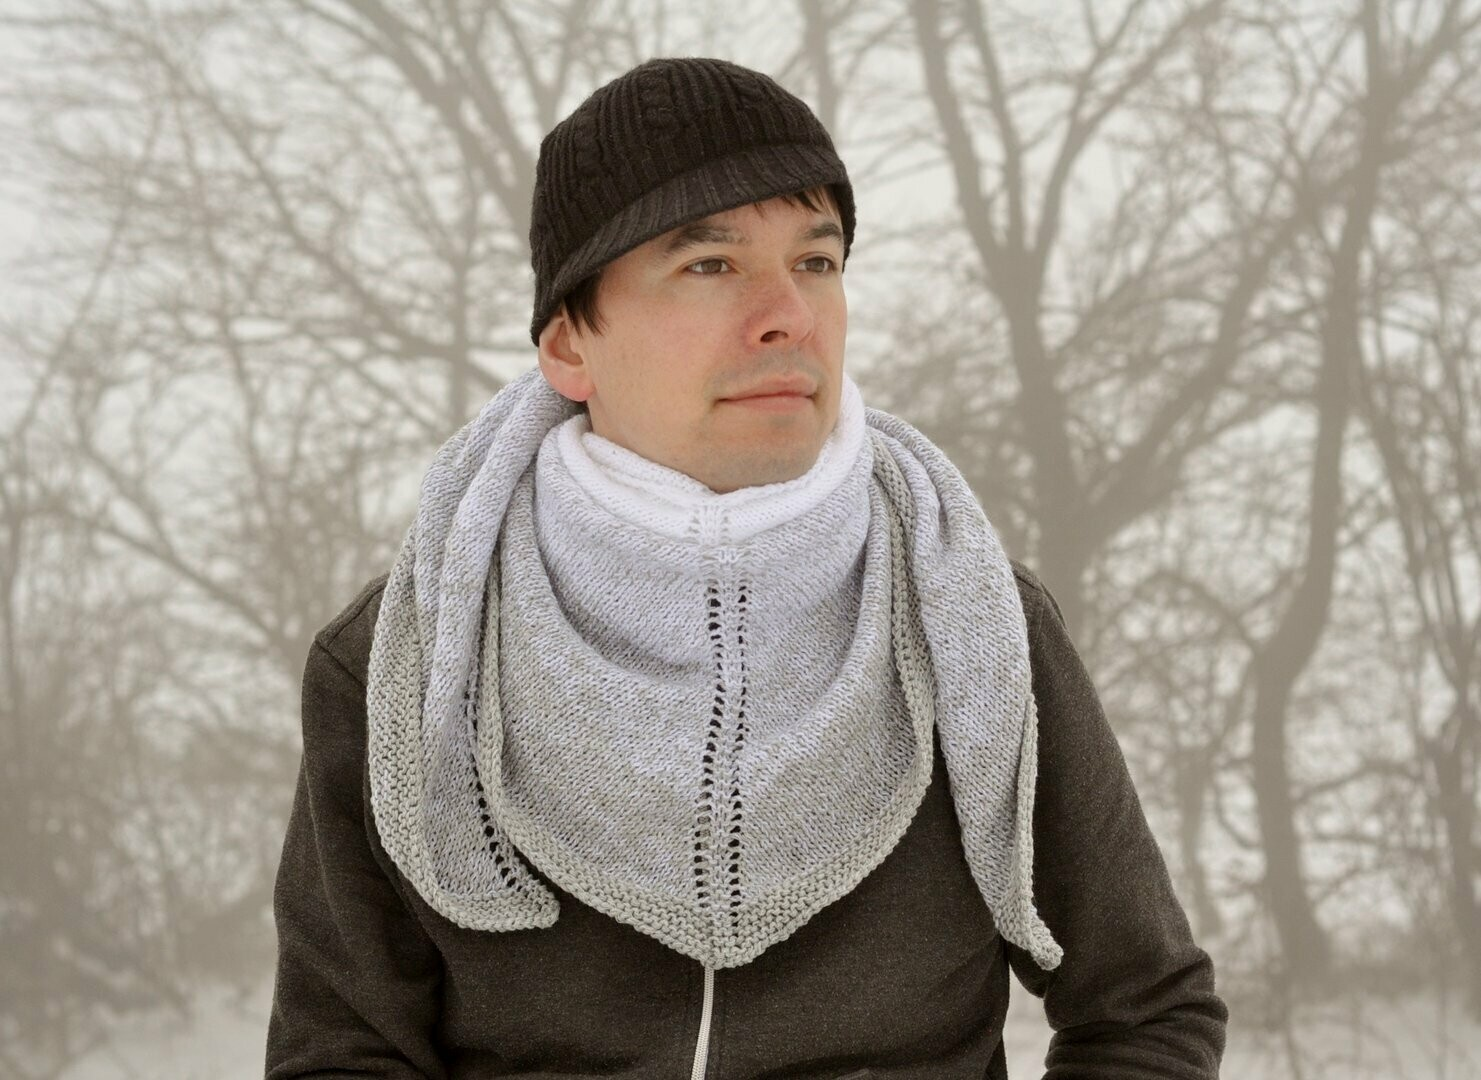 St. Moritz shawl knitting pattern video & PDF - Woolpedia®